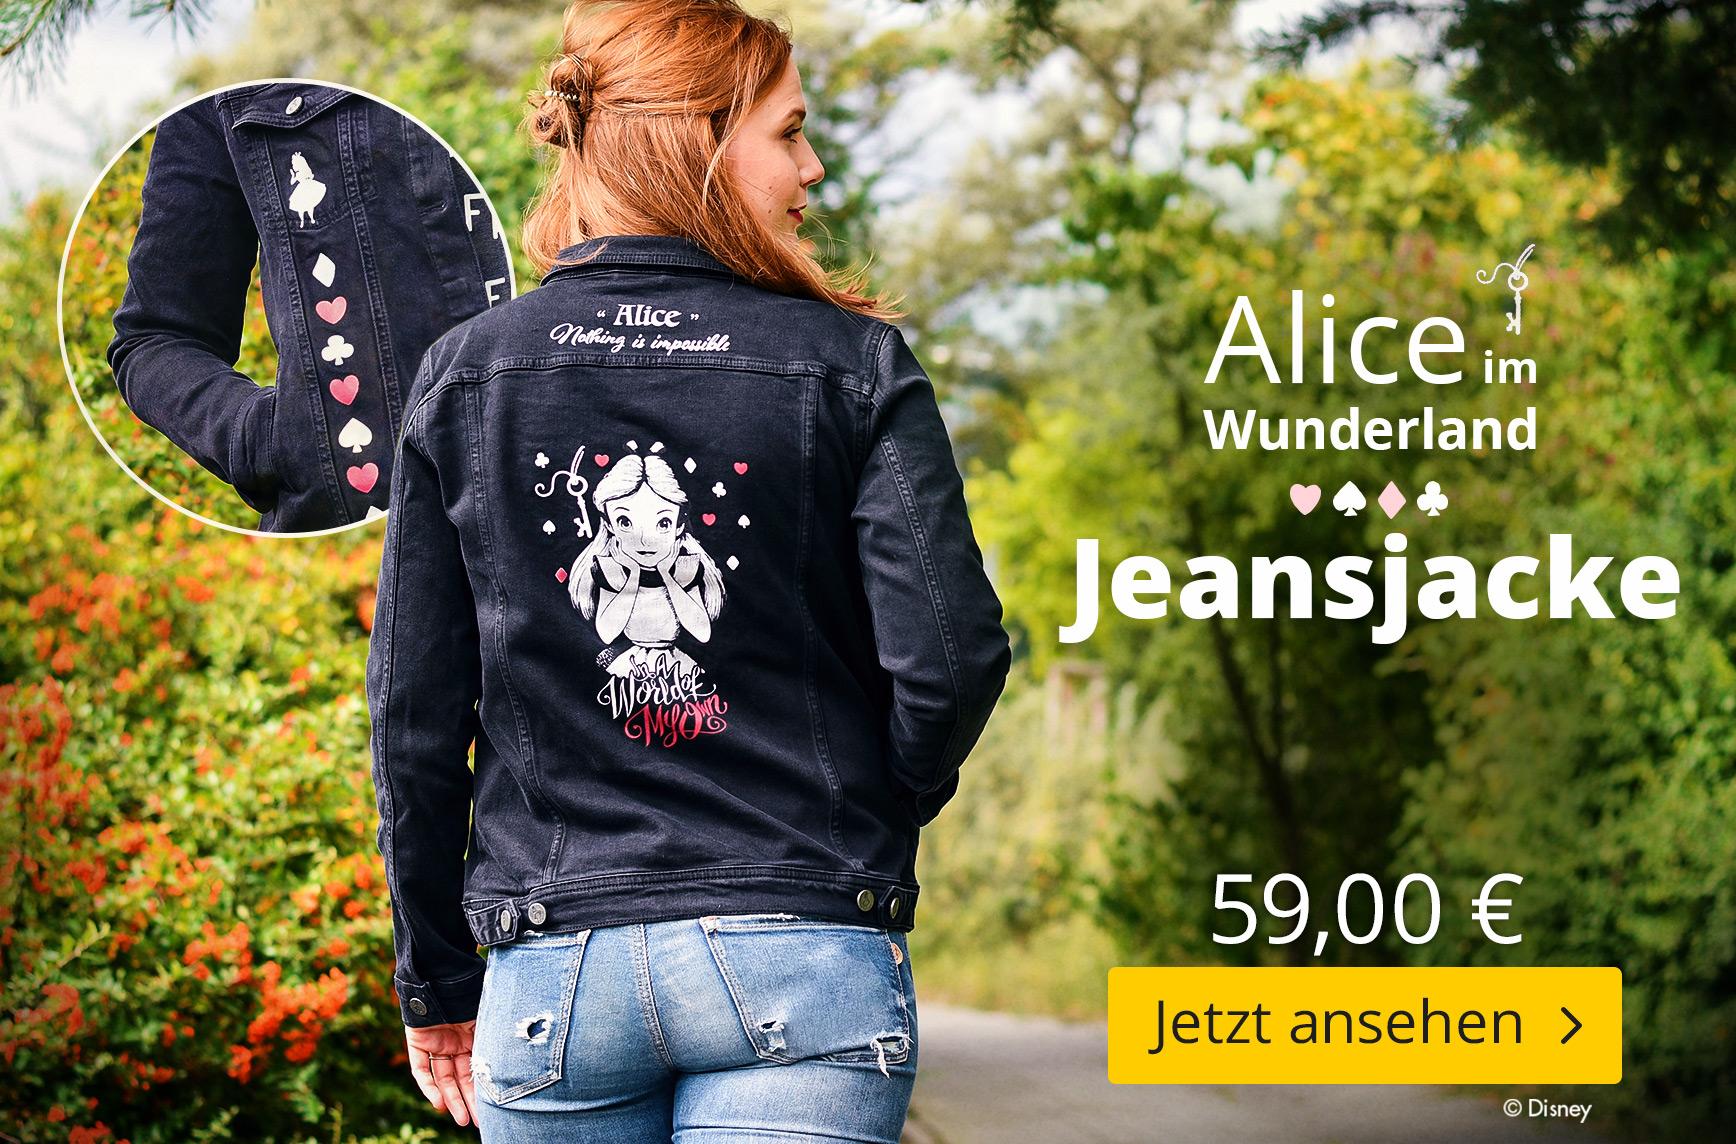 Alice im Wunderland - Jeansjacke Damen schwarz - 59 EUR